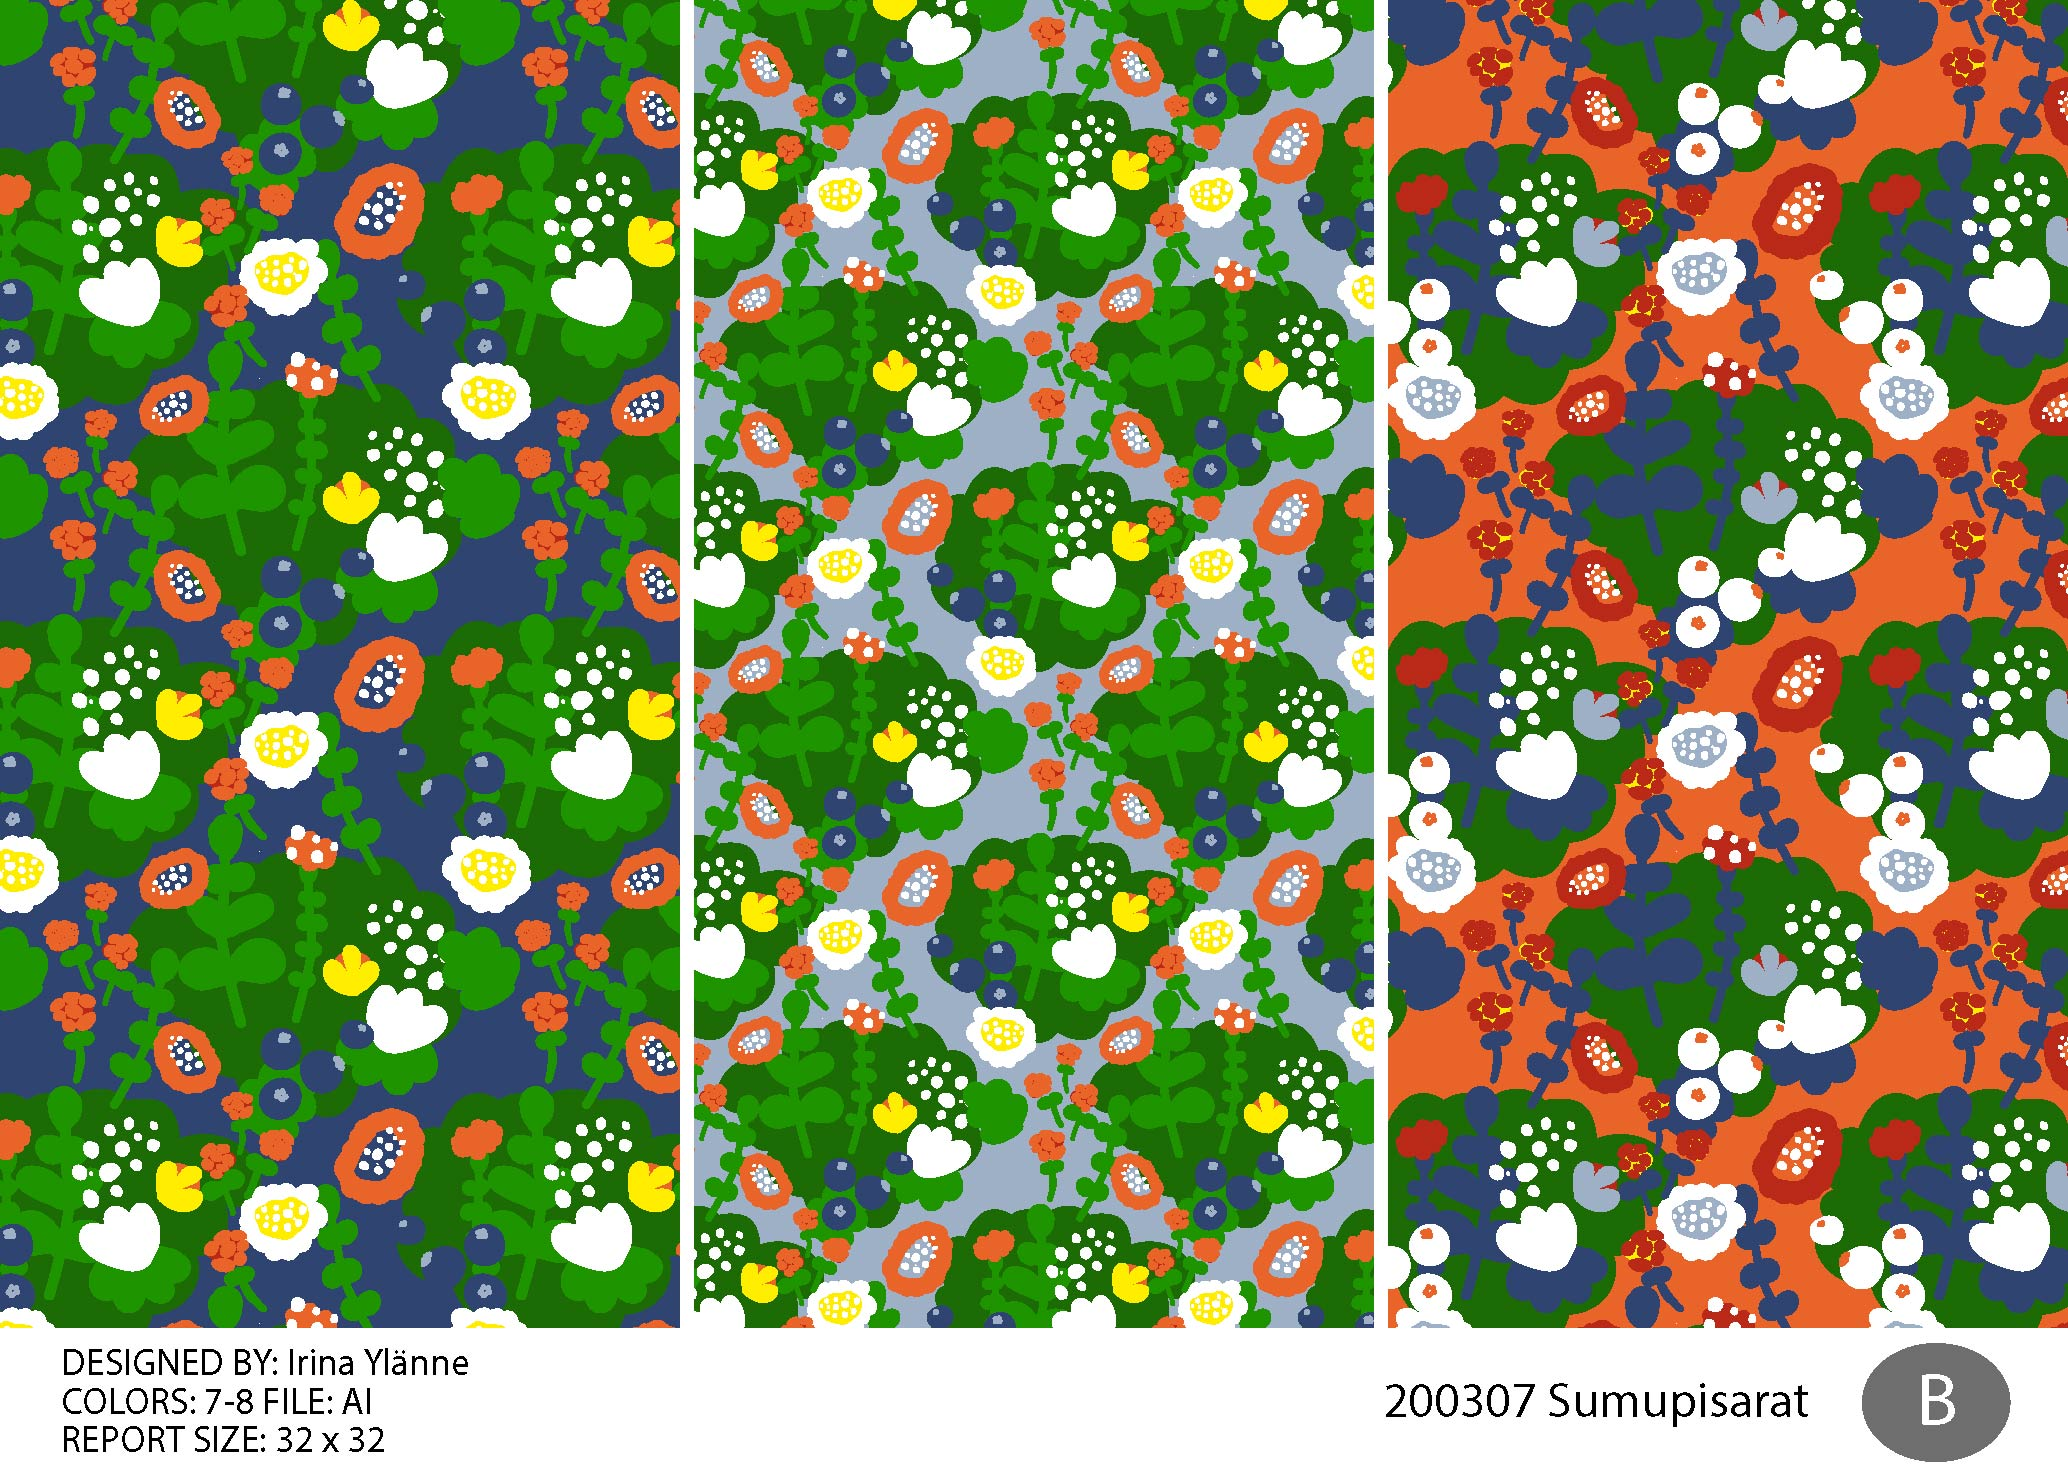 irina_Sumupisarat_200307-02